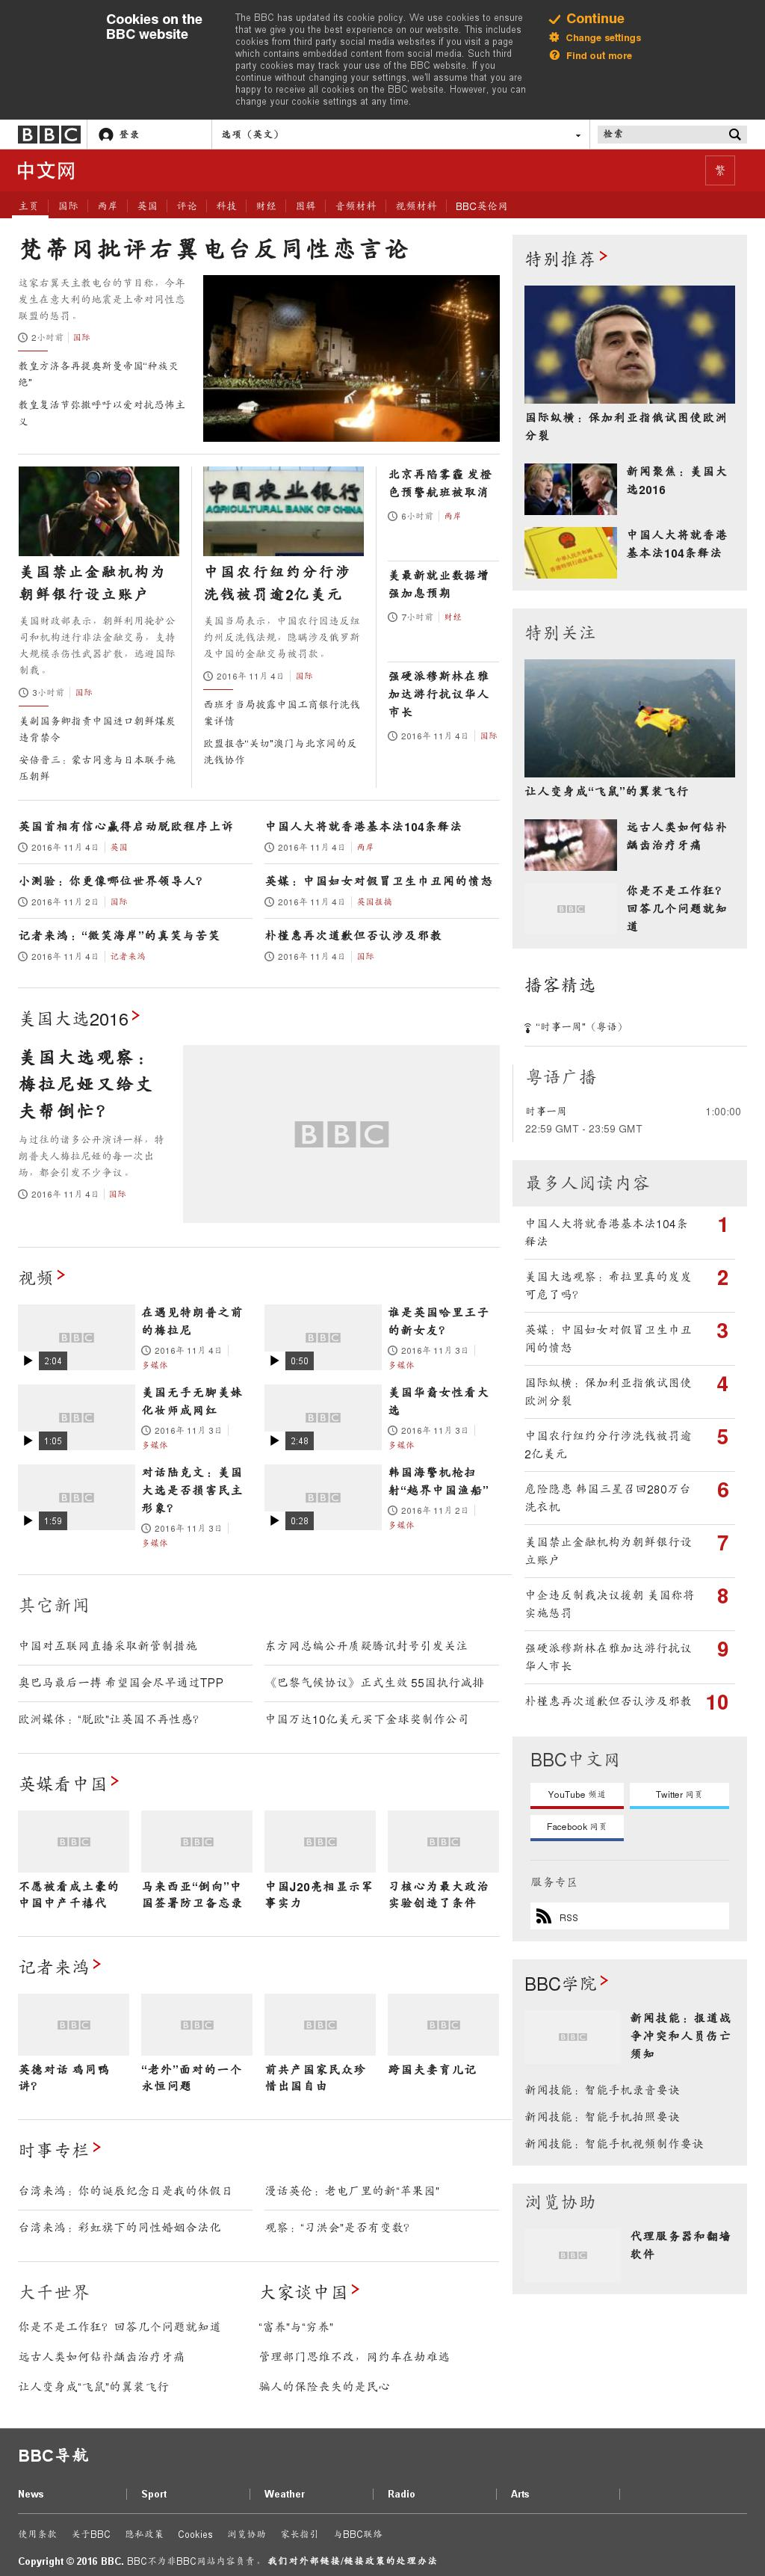 BBC (Chinese) at Saturday Nov. 5, 2016, 10:01 a.m. UTC